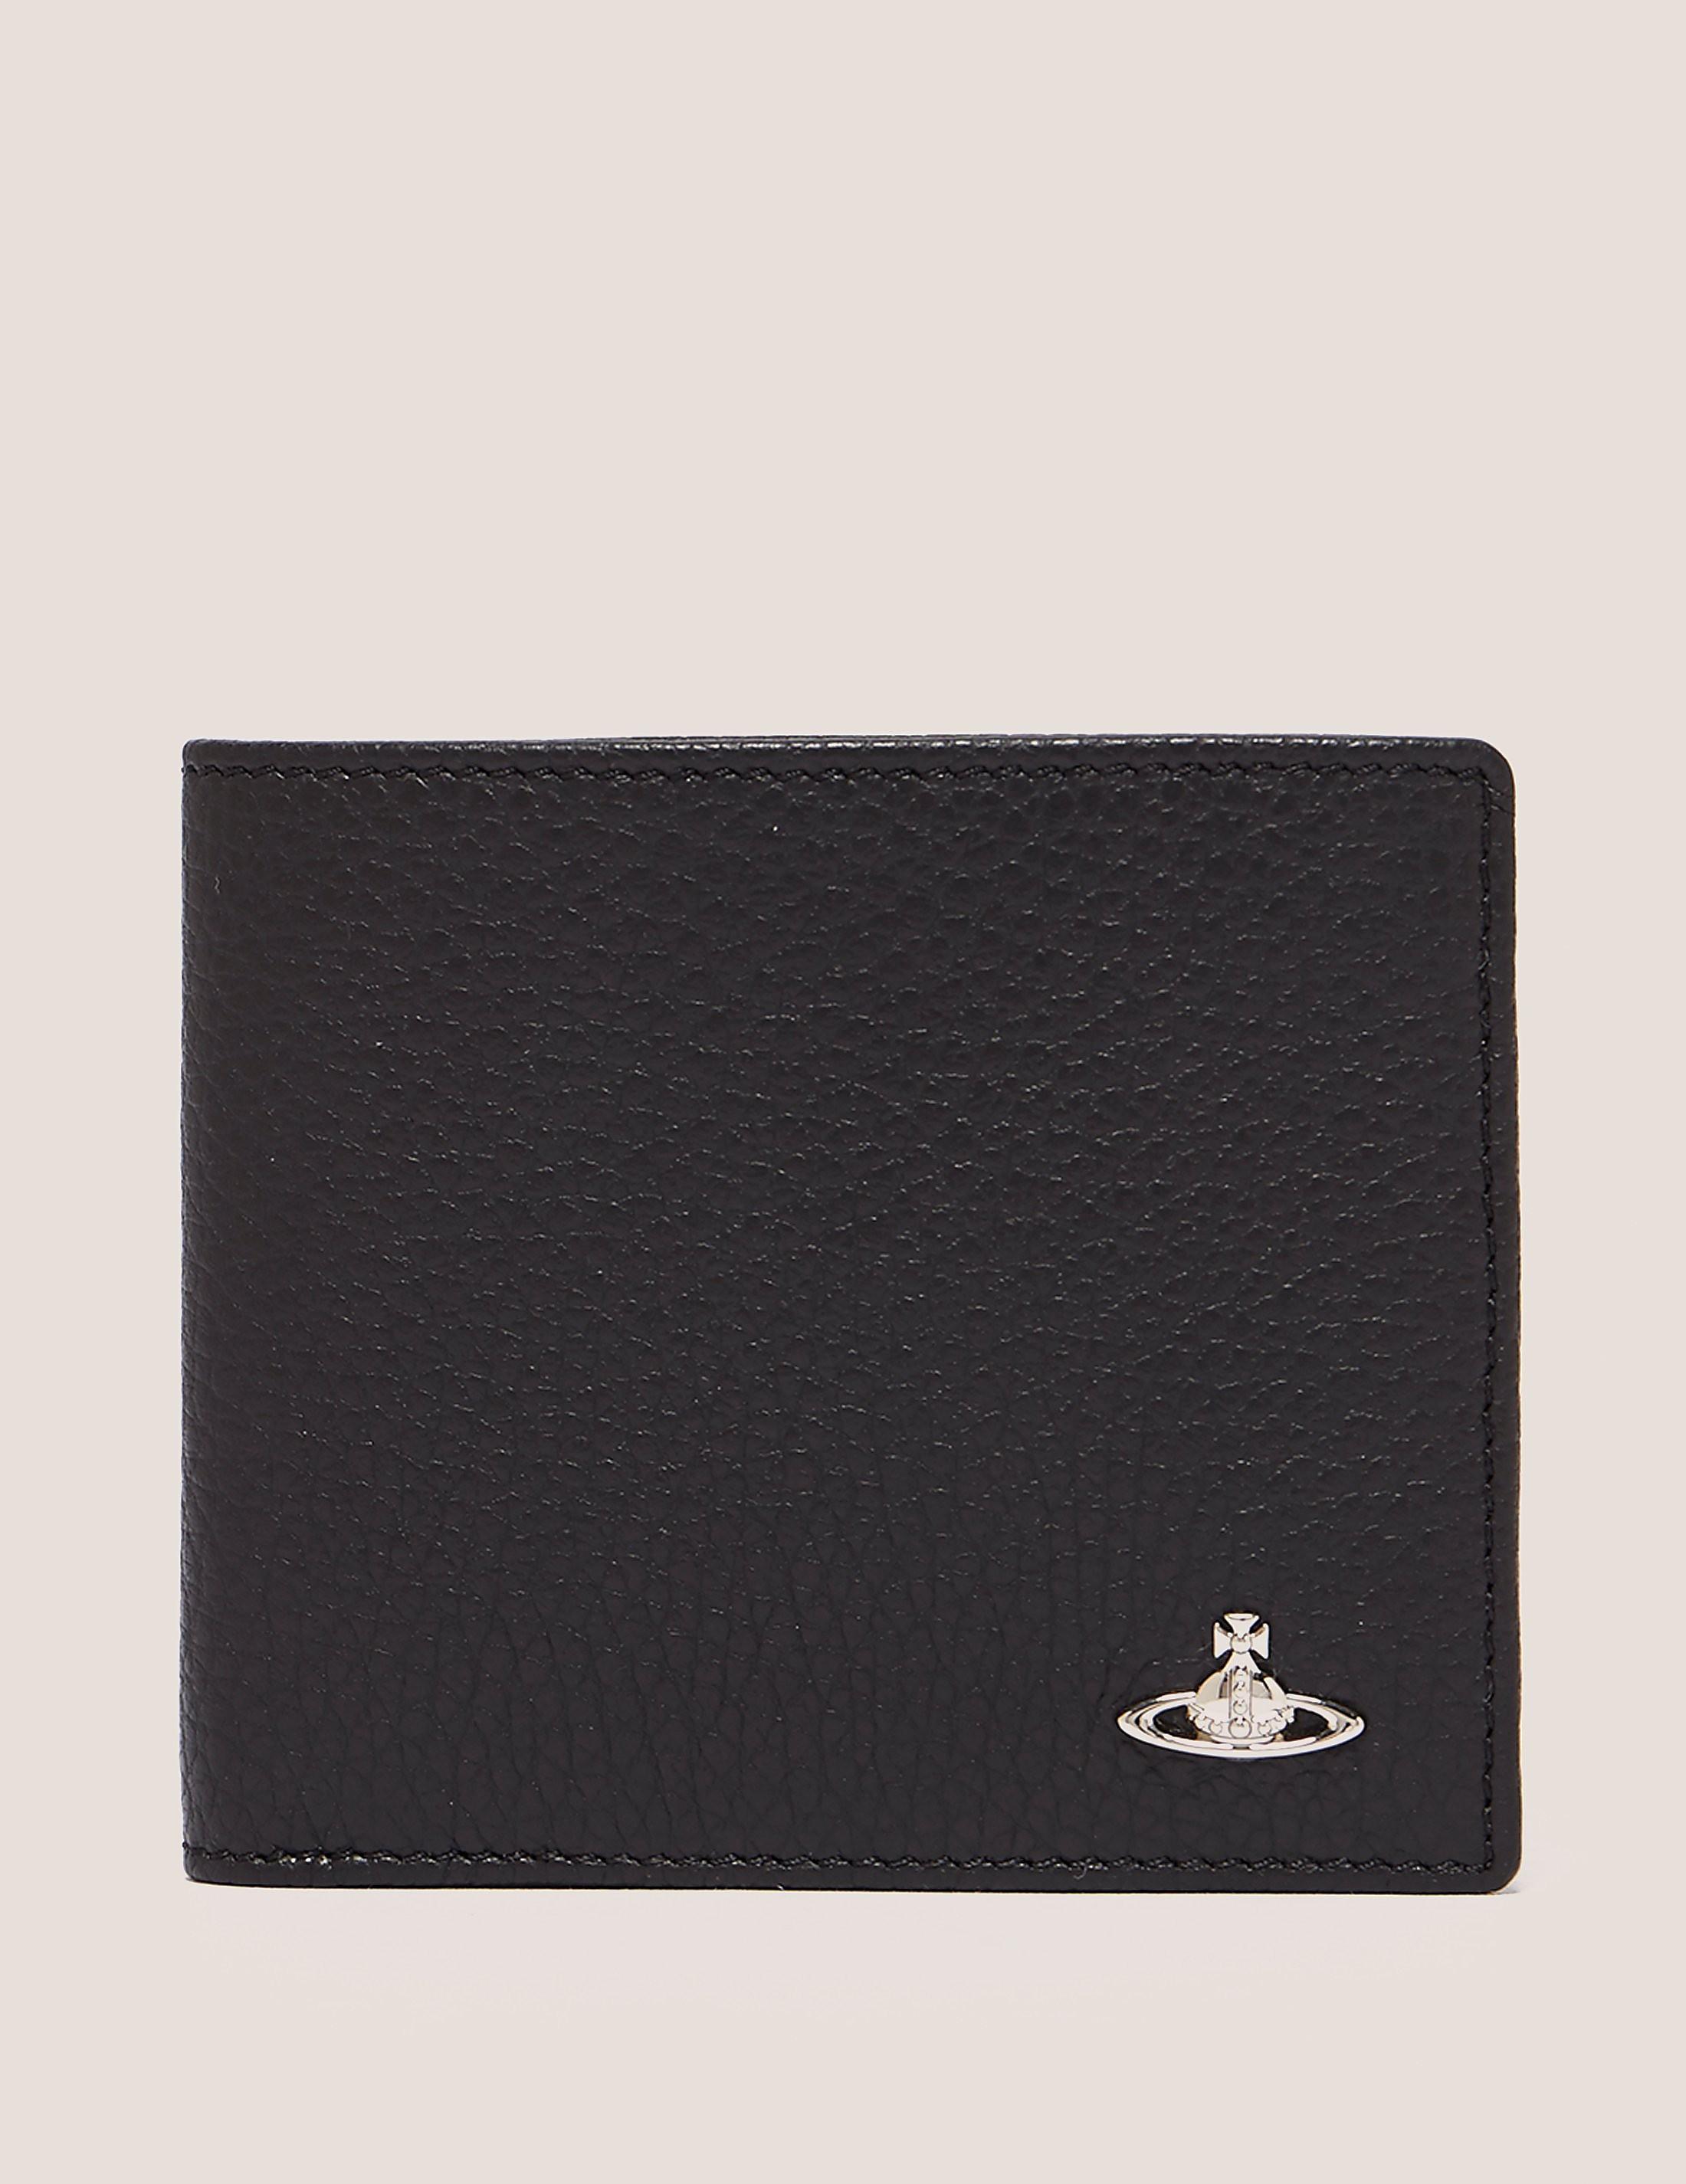 Vivienne Westwood Card Holder